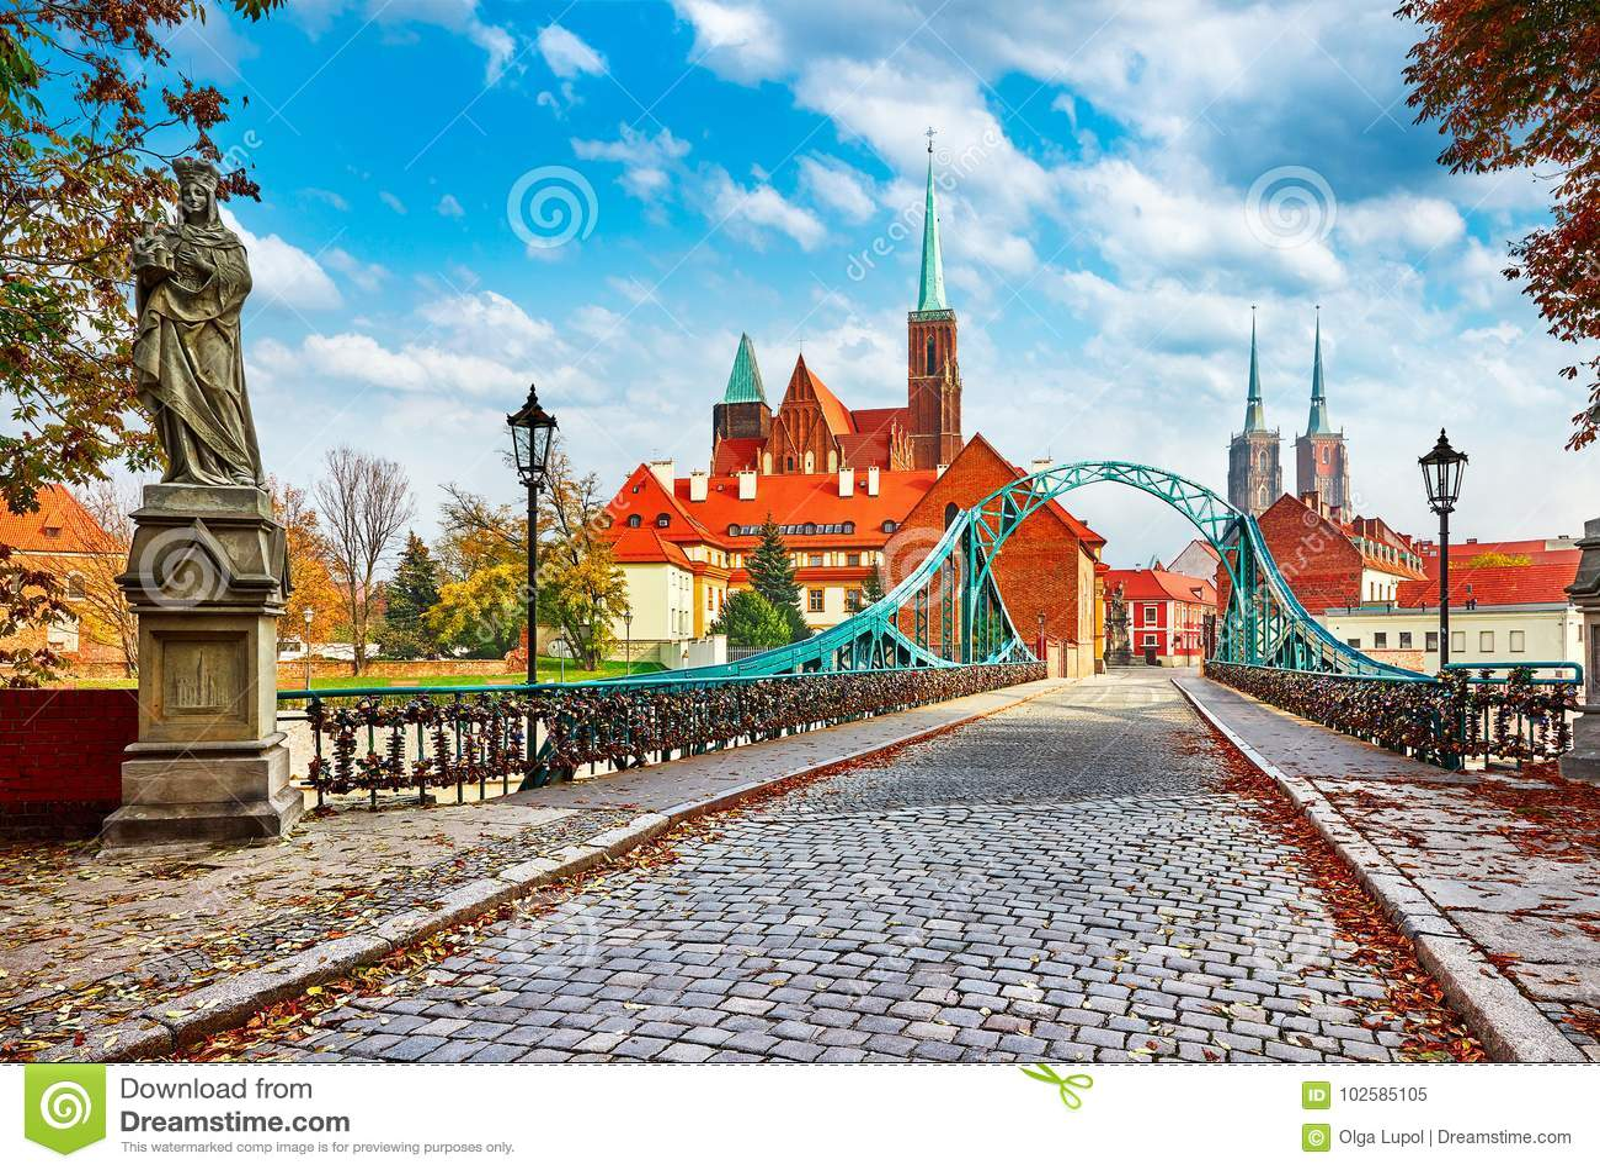 Cathedral Island in Wroclaw Poland green bridge